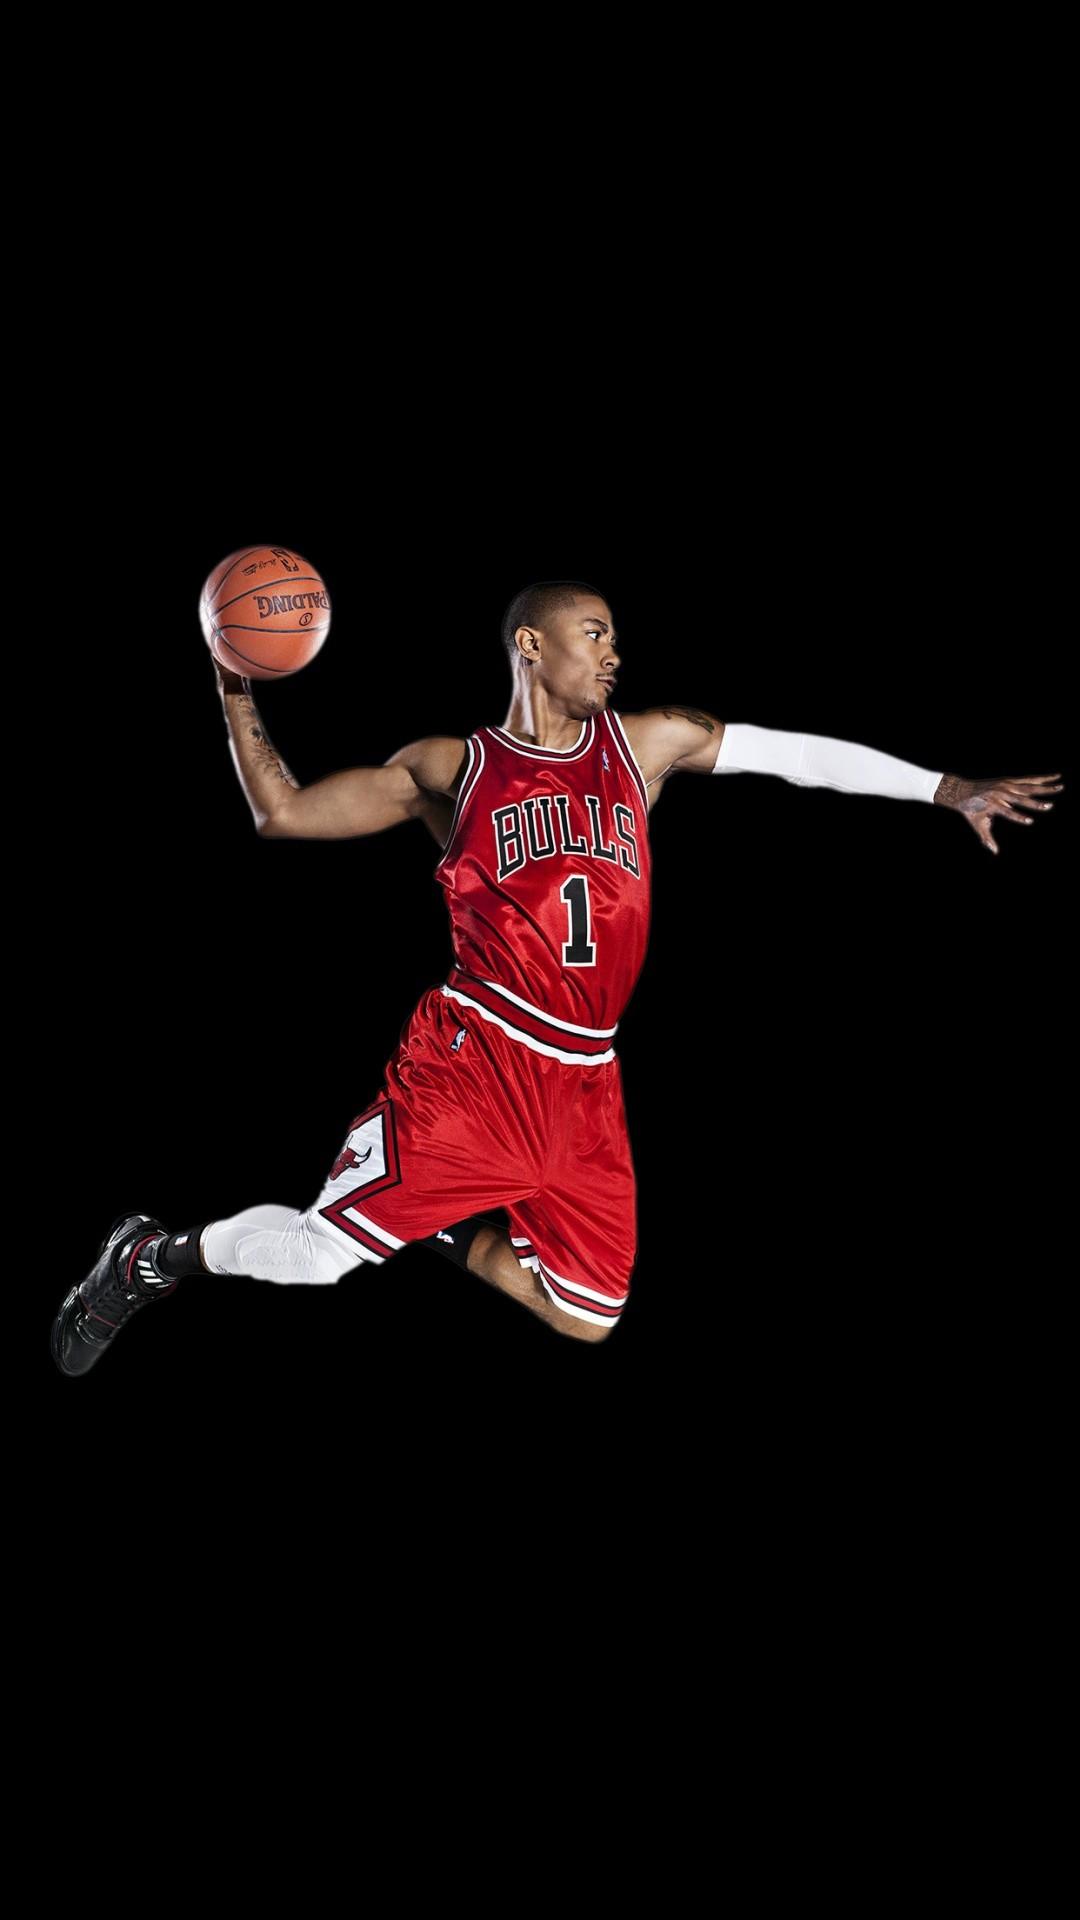 Chicago Bulls Derrick Rose iPhone 6+ HD Wallpaper – https://freebestpicture.